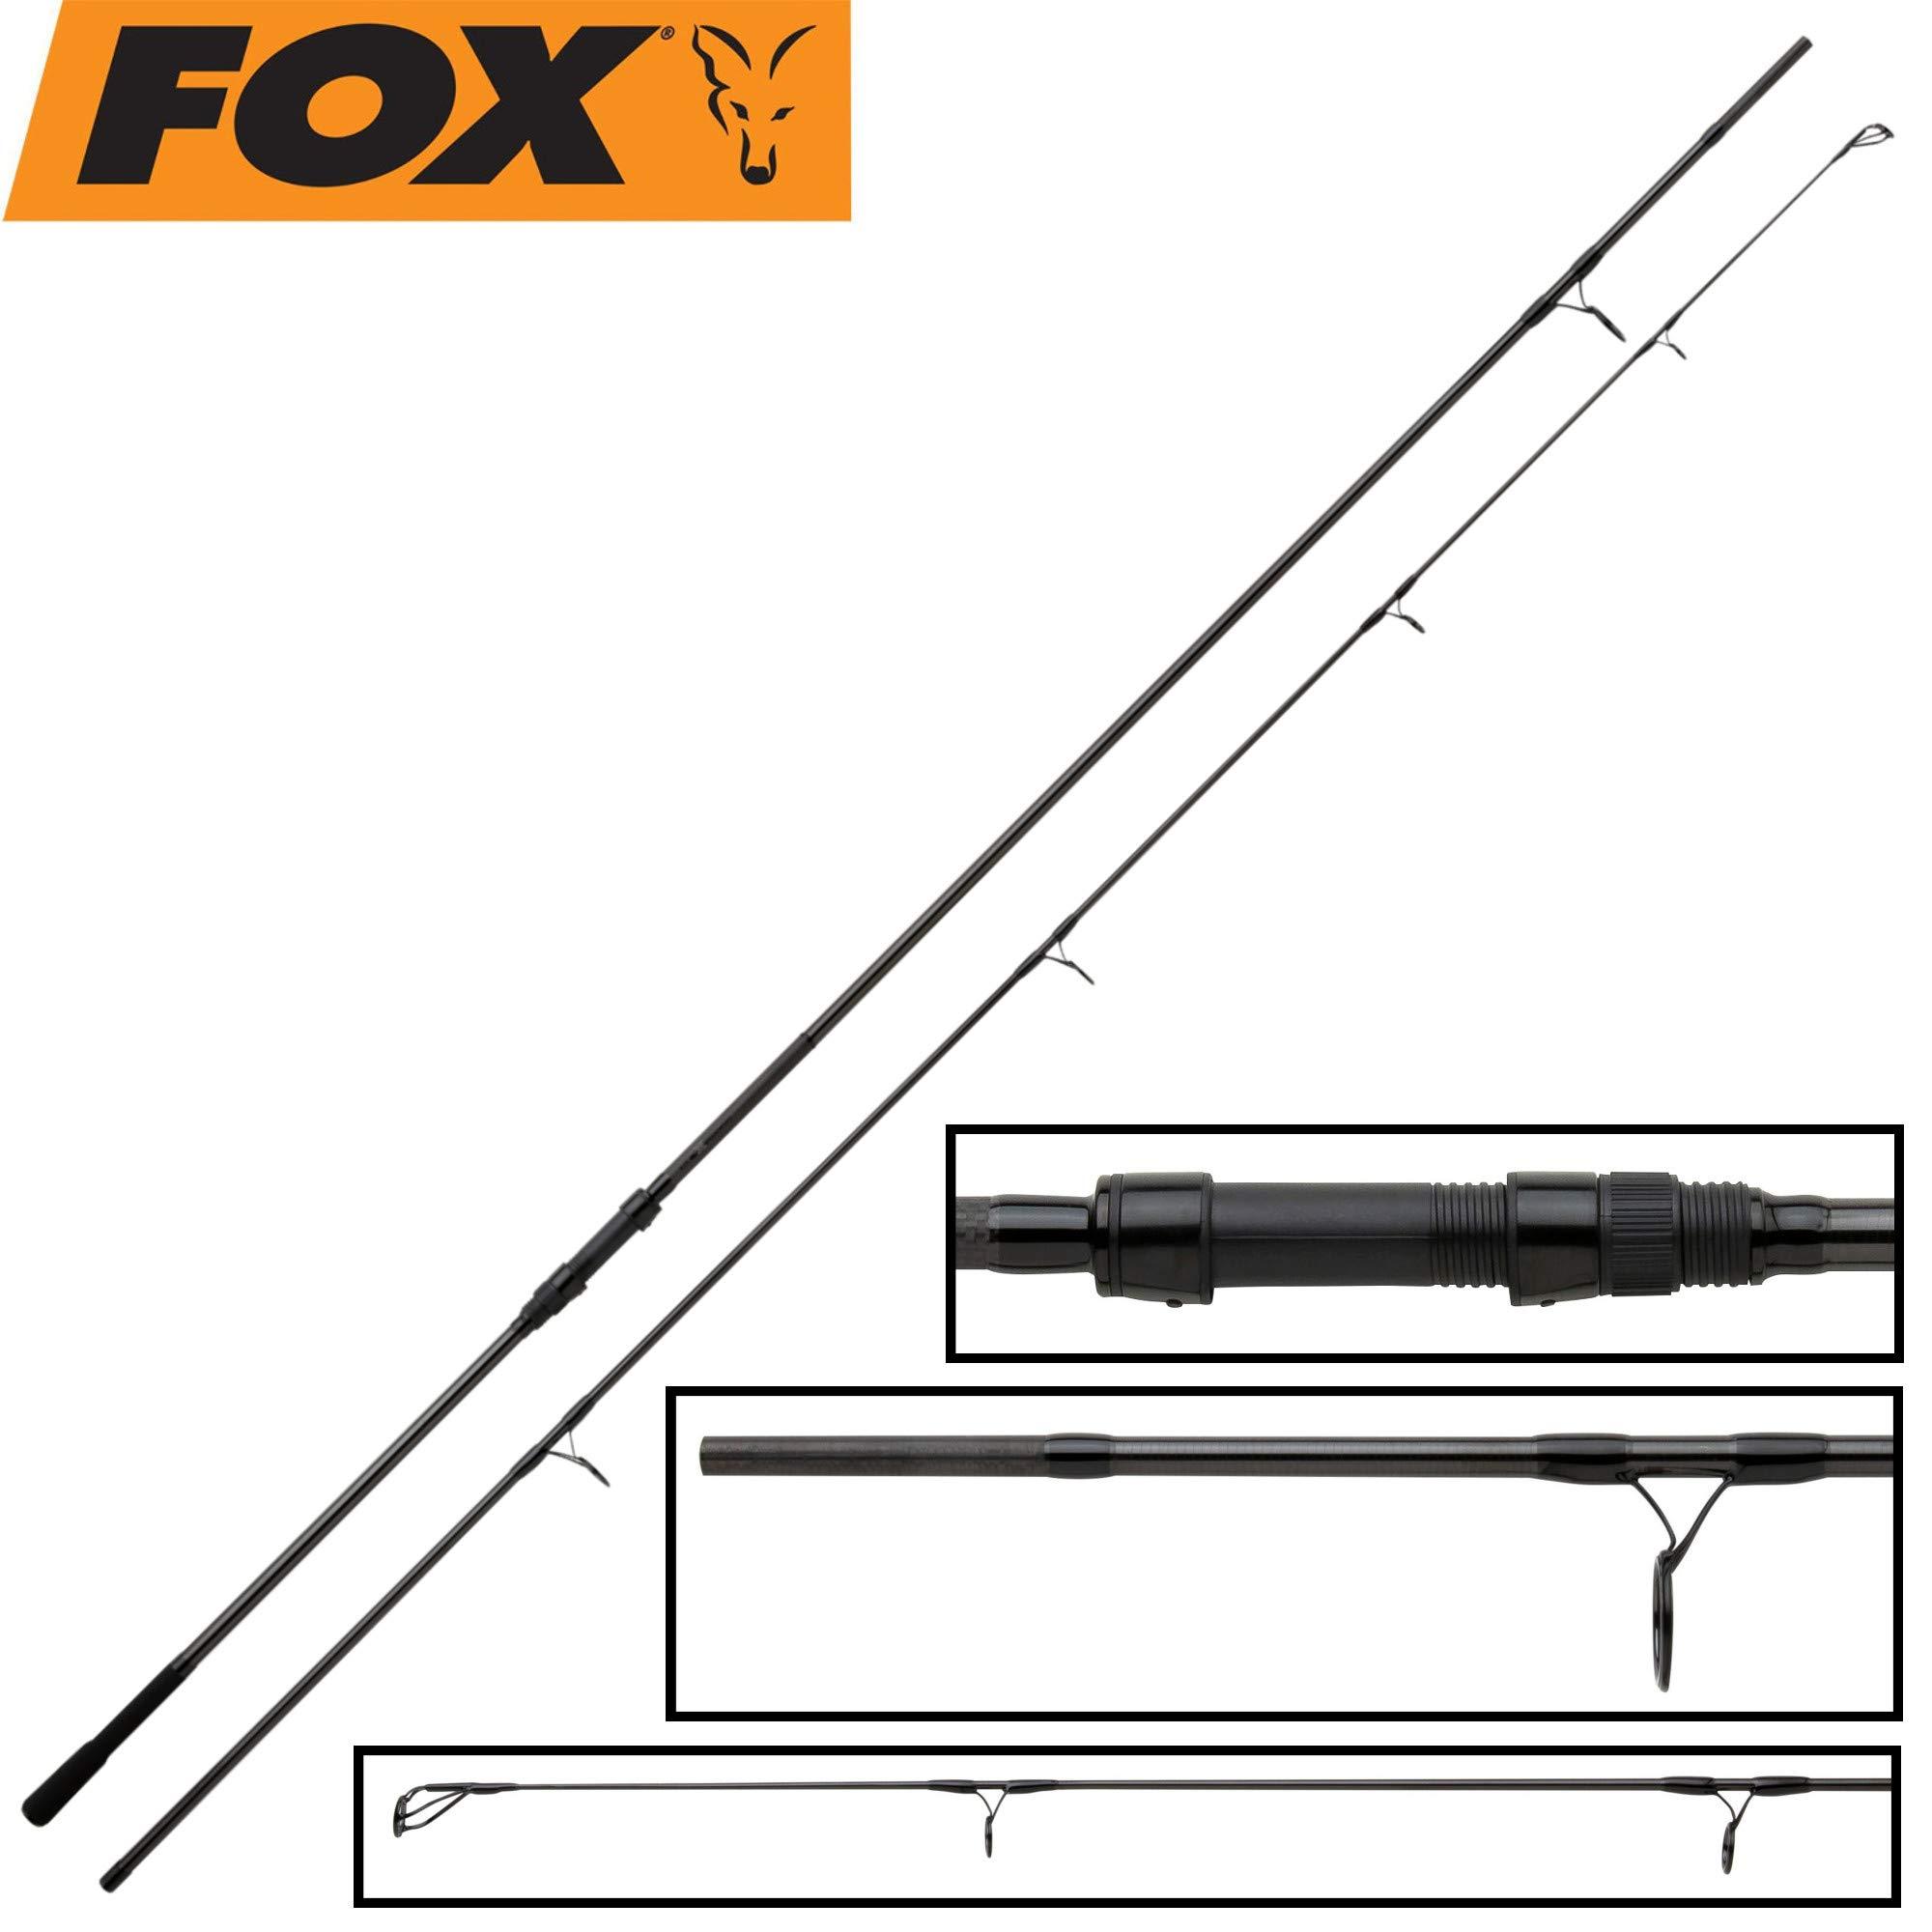 CRD255 Fox NEW EOS 13ft 3.5lb Carp Fishing 2 Piece Rod